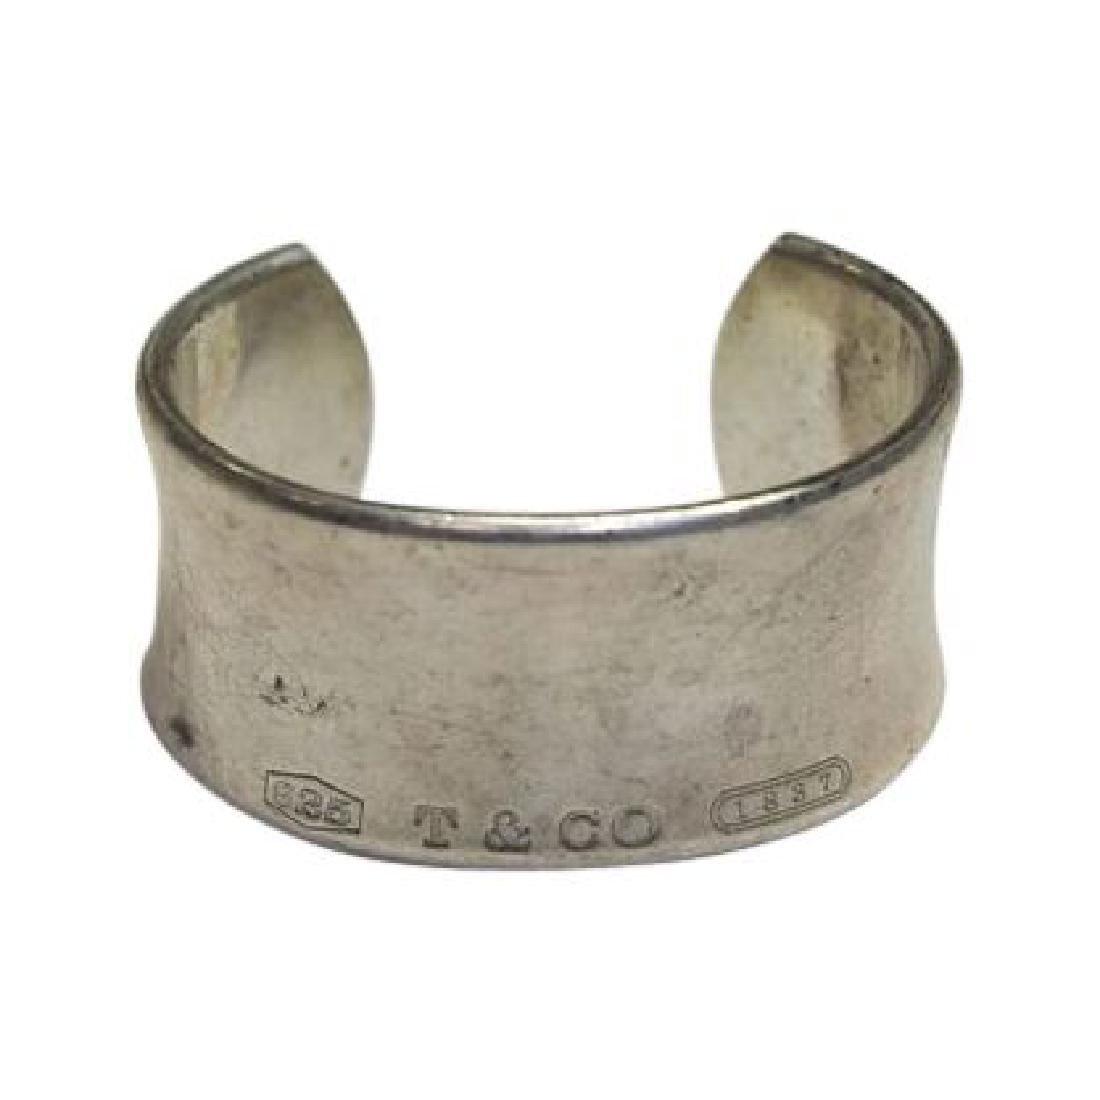 Tiffany Sterling Silver Cuff Bracelet